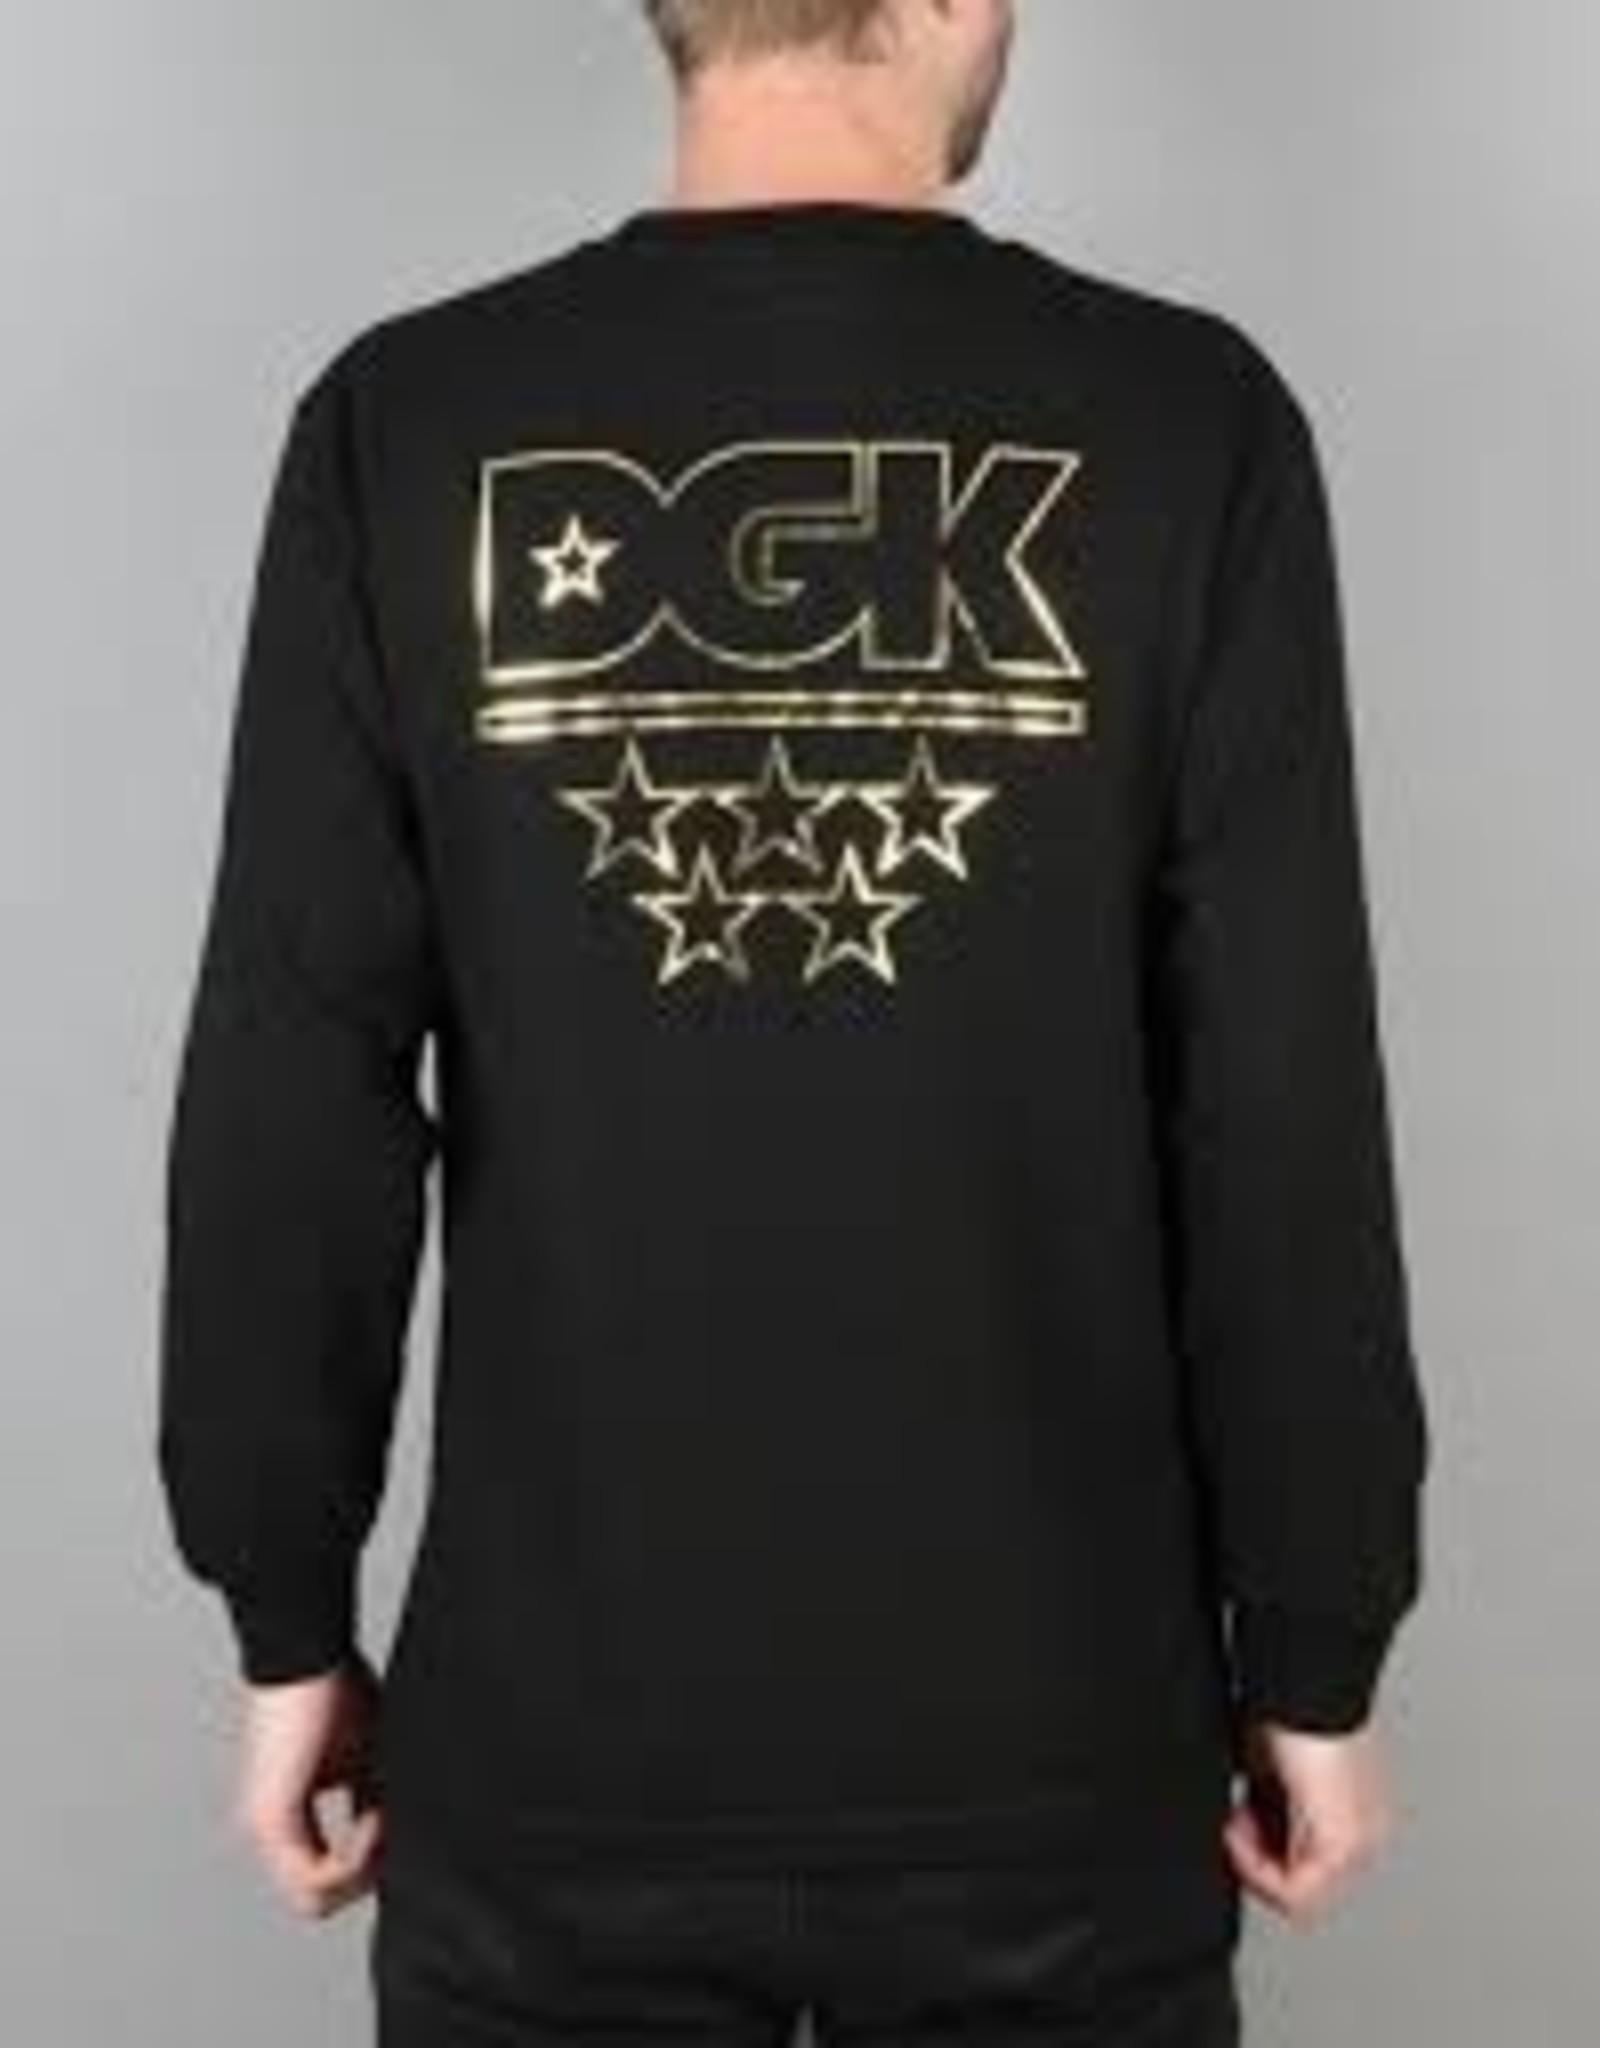 DGK DGK LS All Stars Tee Black